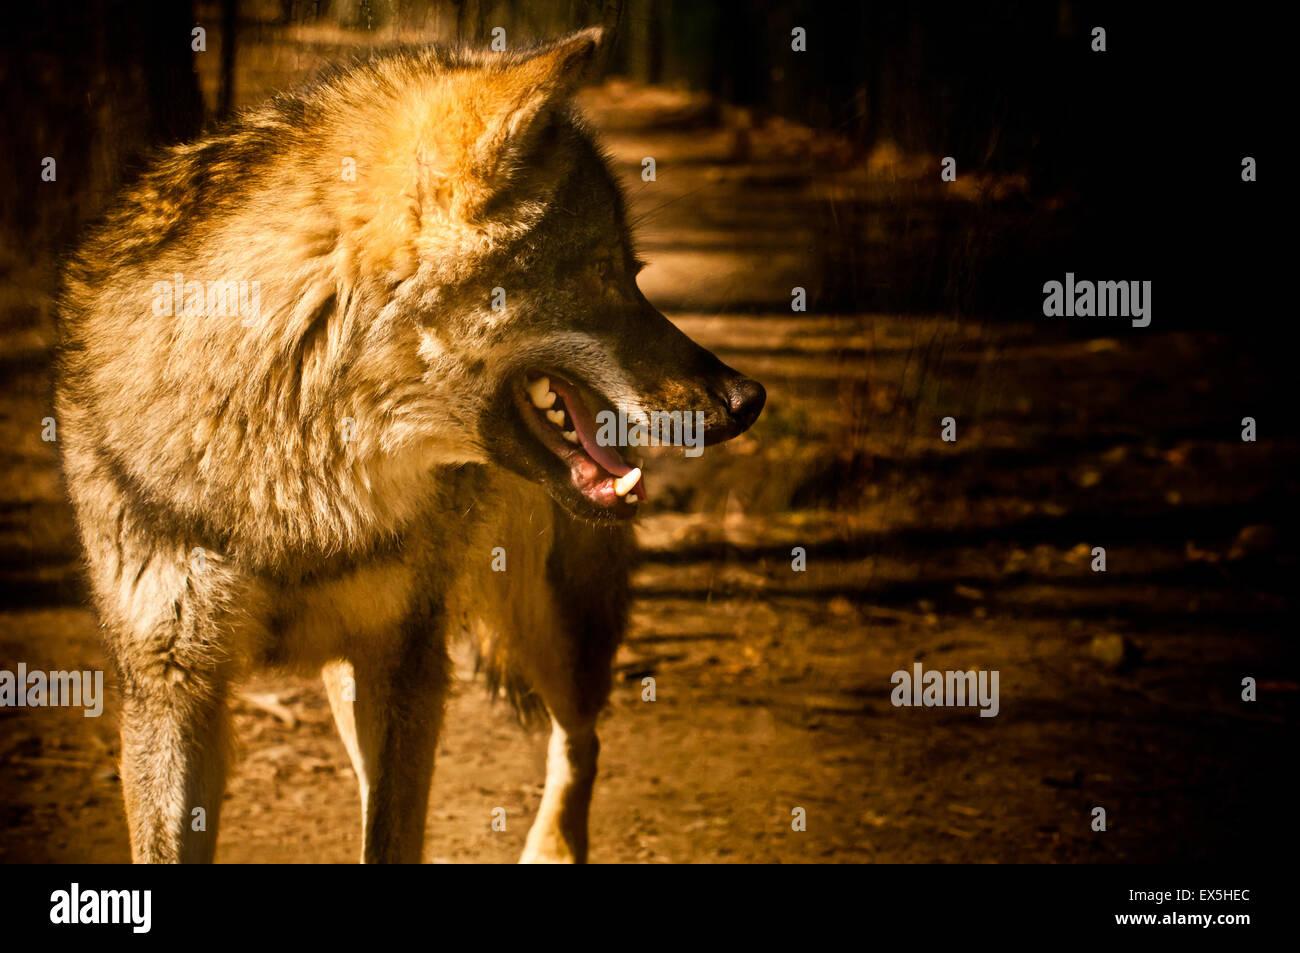 Eurasian wolf in captivity - Stock Image